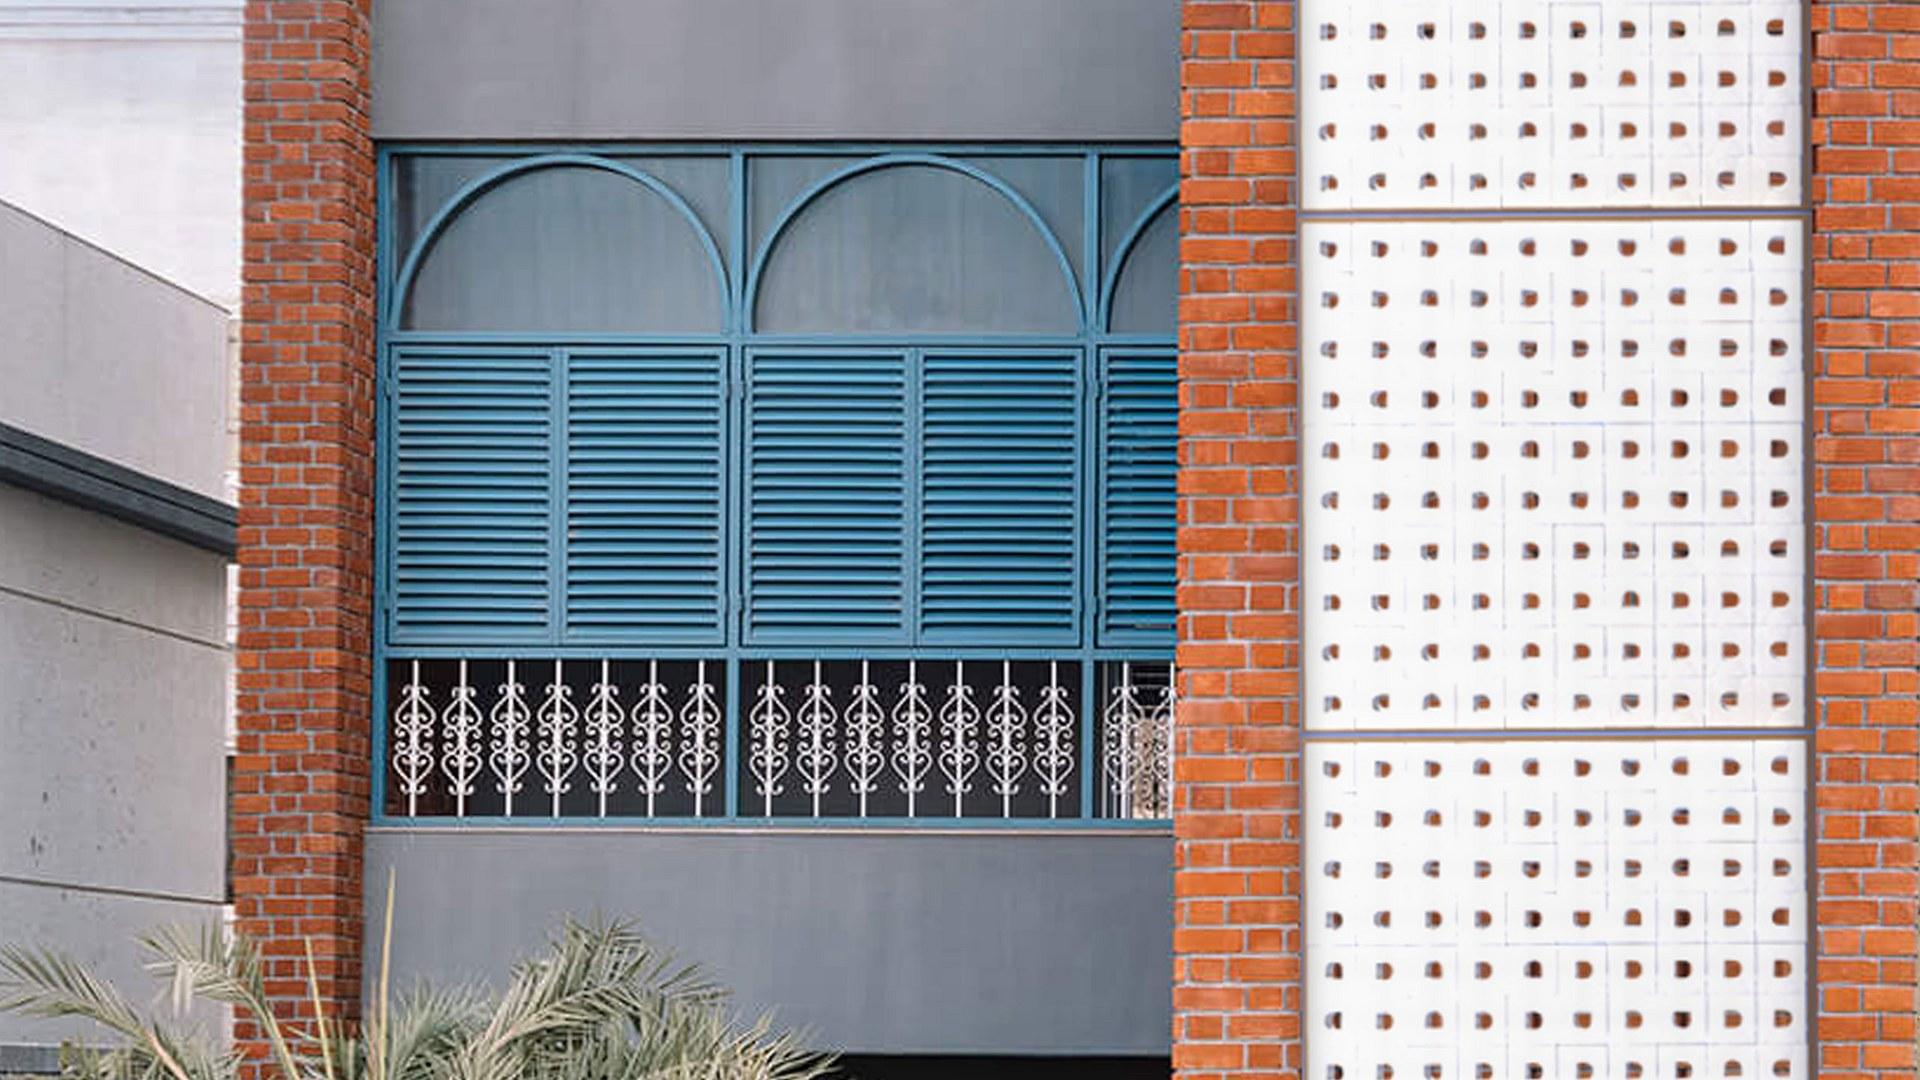 NewBlue x Industhan Ceramics Passive Cooling tiles